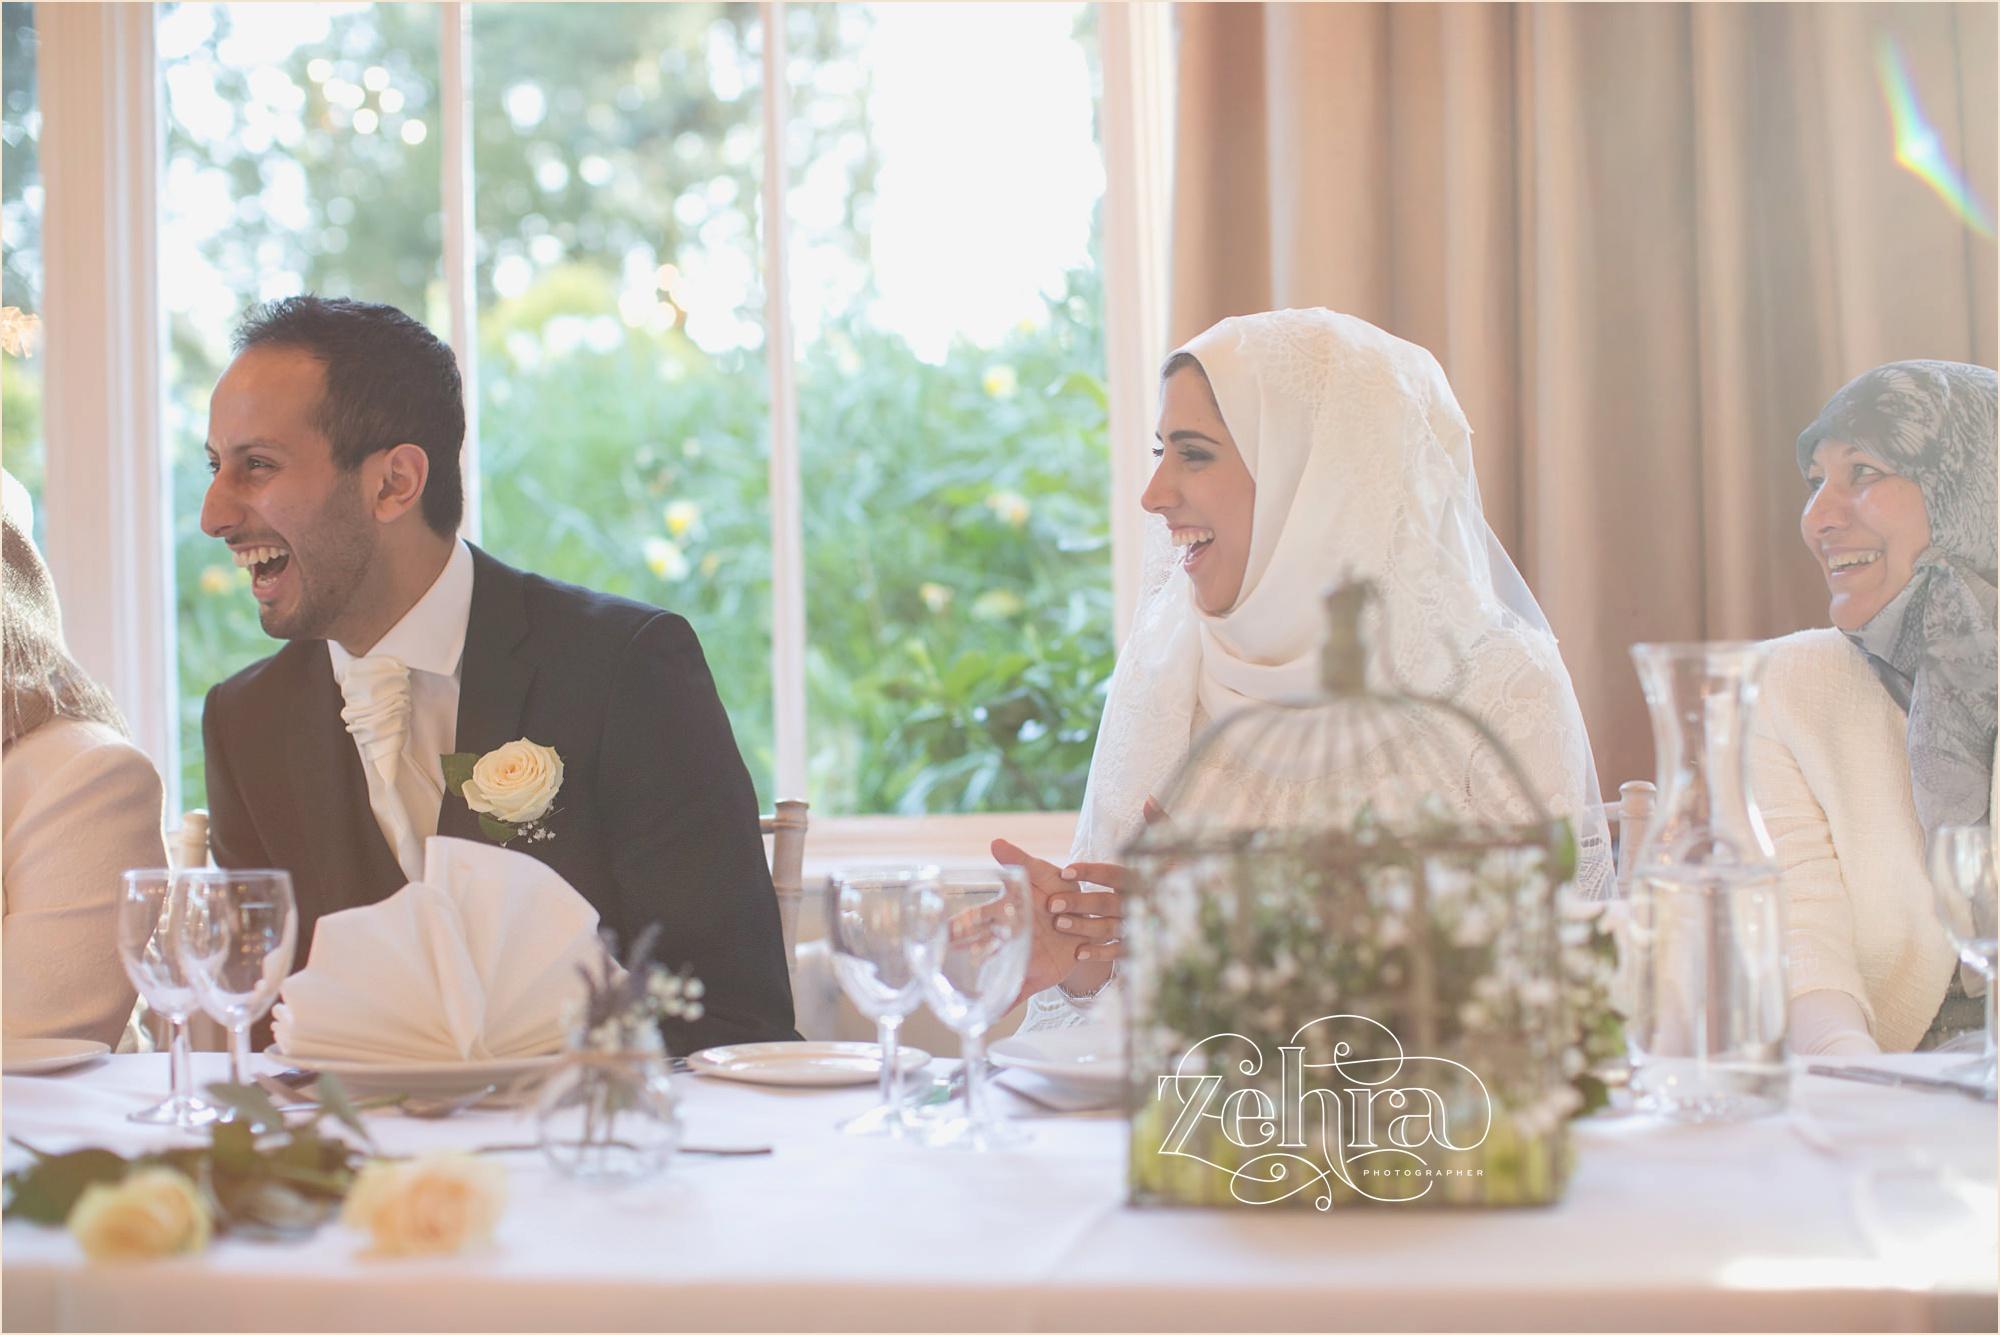 jasira manchester wedding photographer_0112.jpg